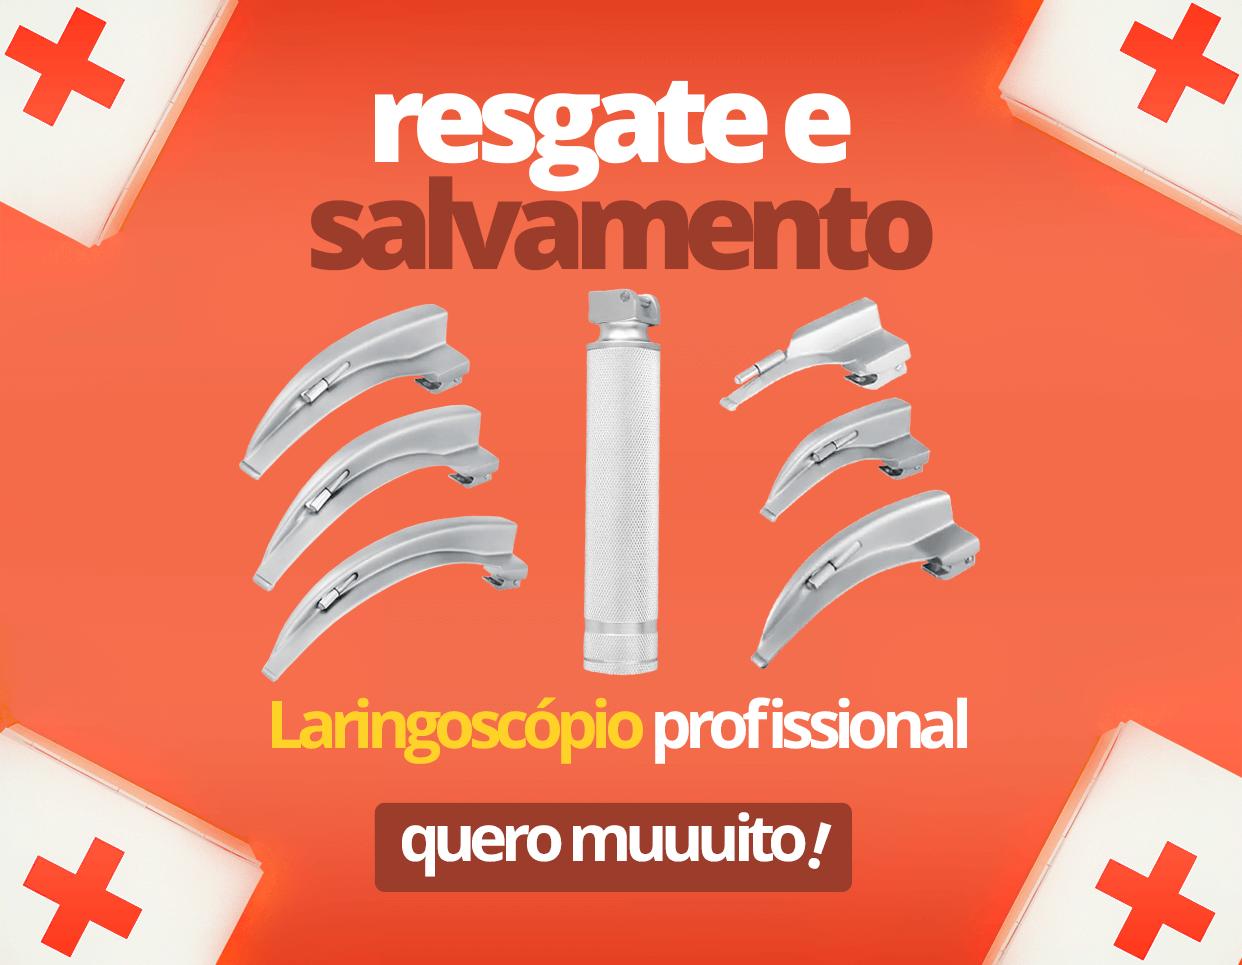 Laringo - Resgate e Salvamento - banner1